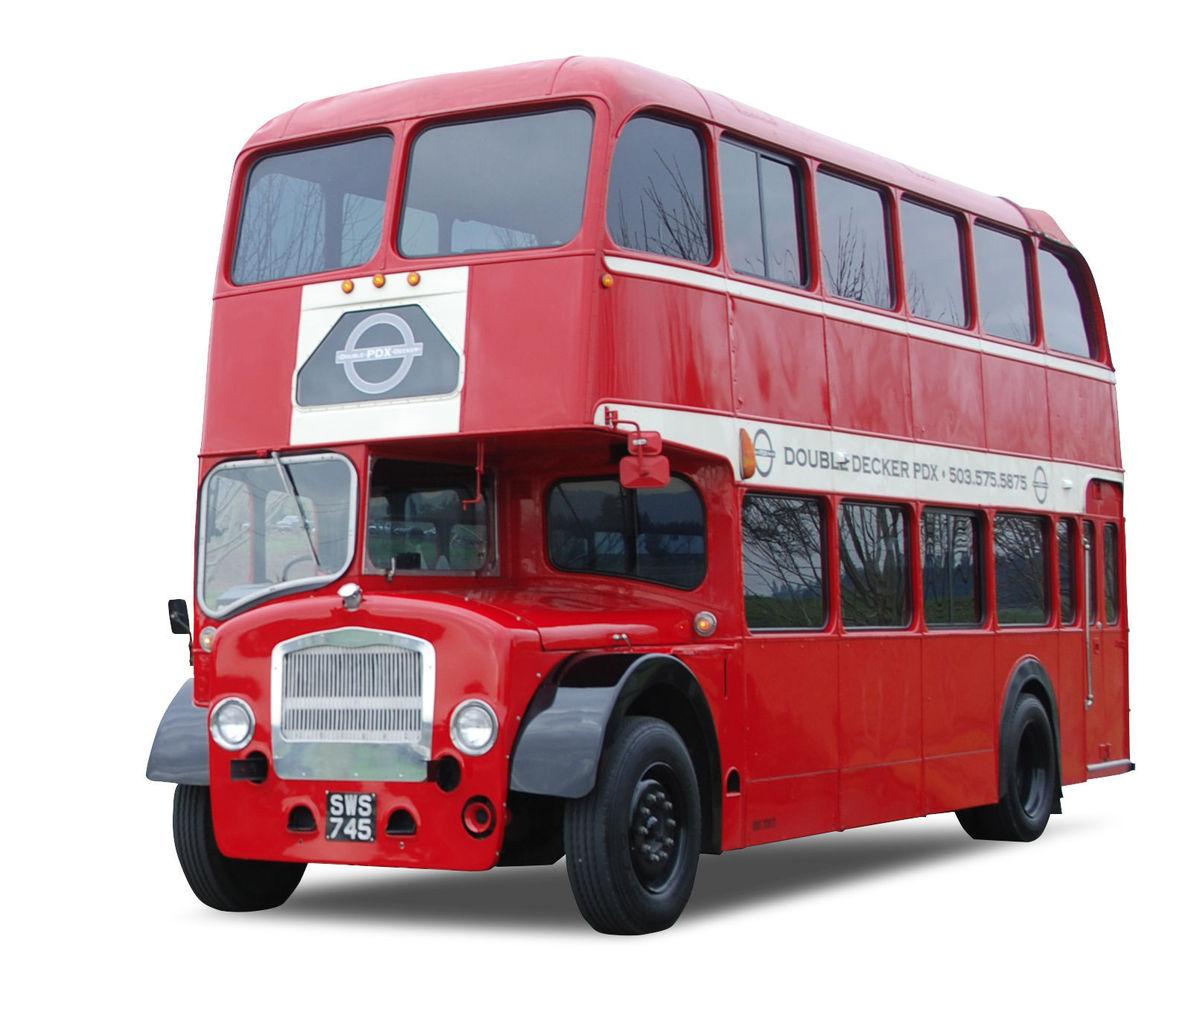 Double Decker London Bus Bed